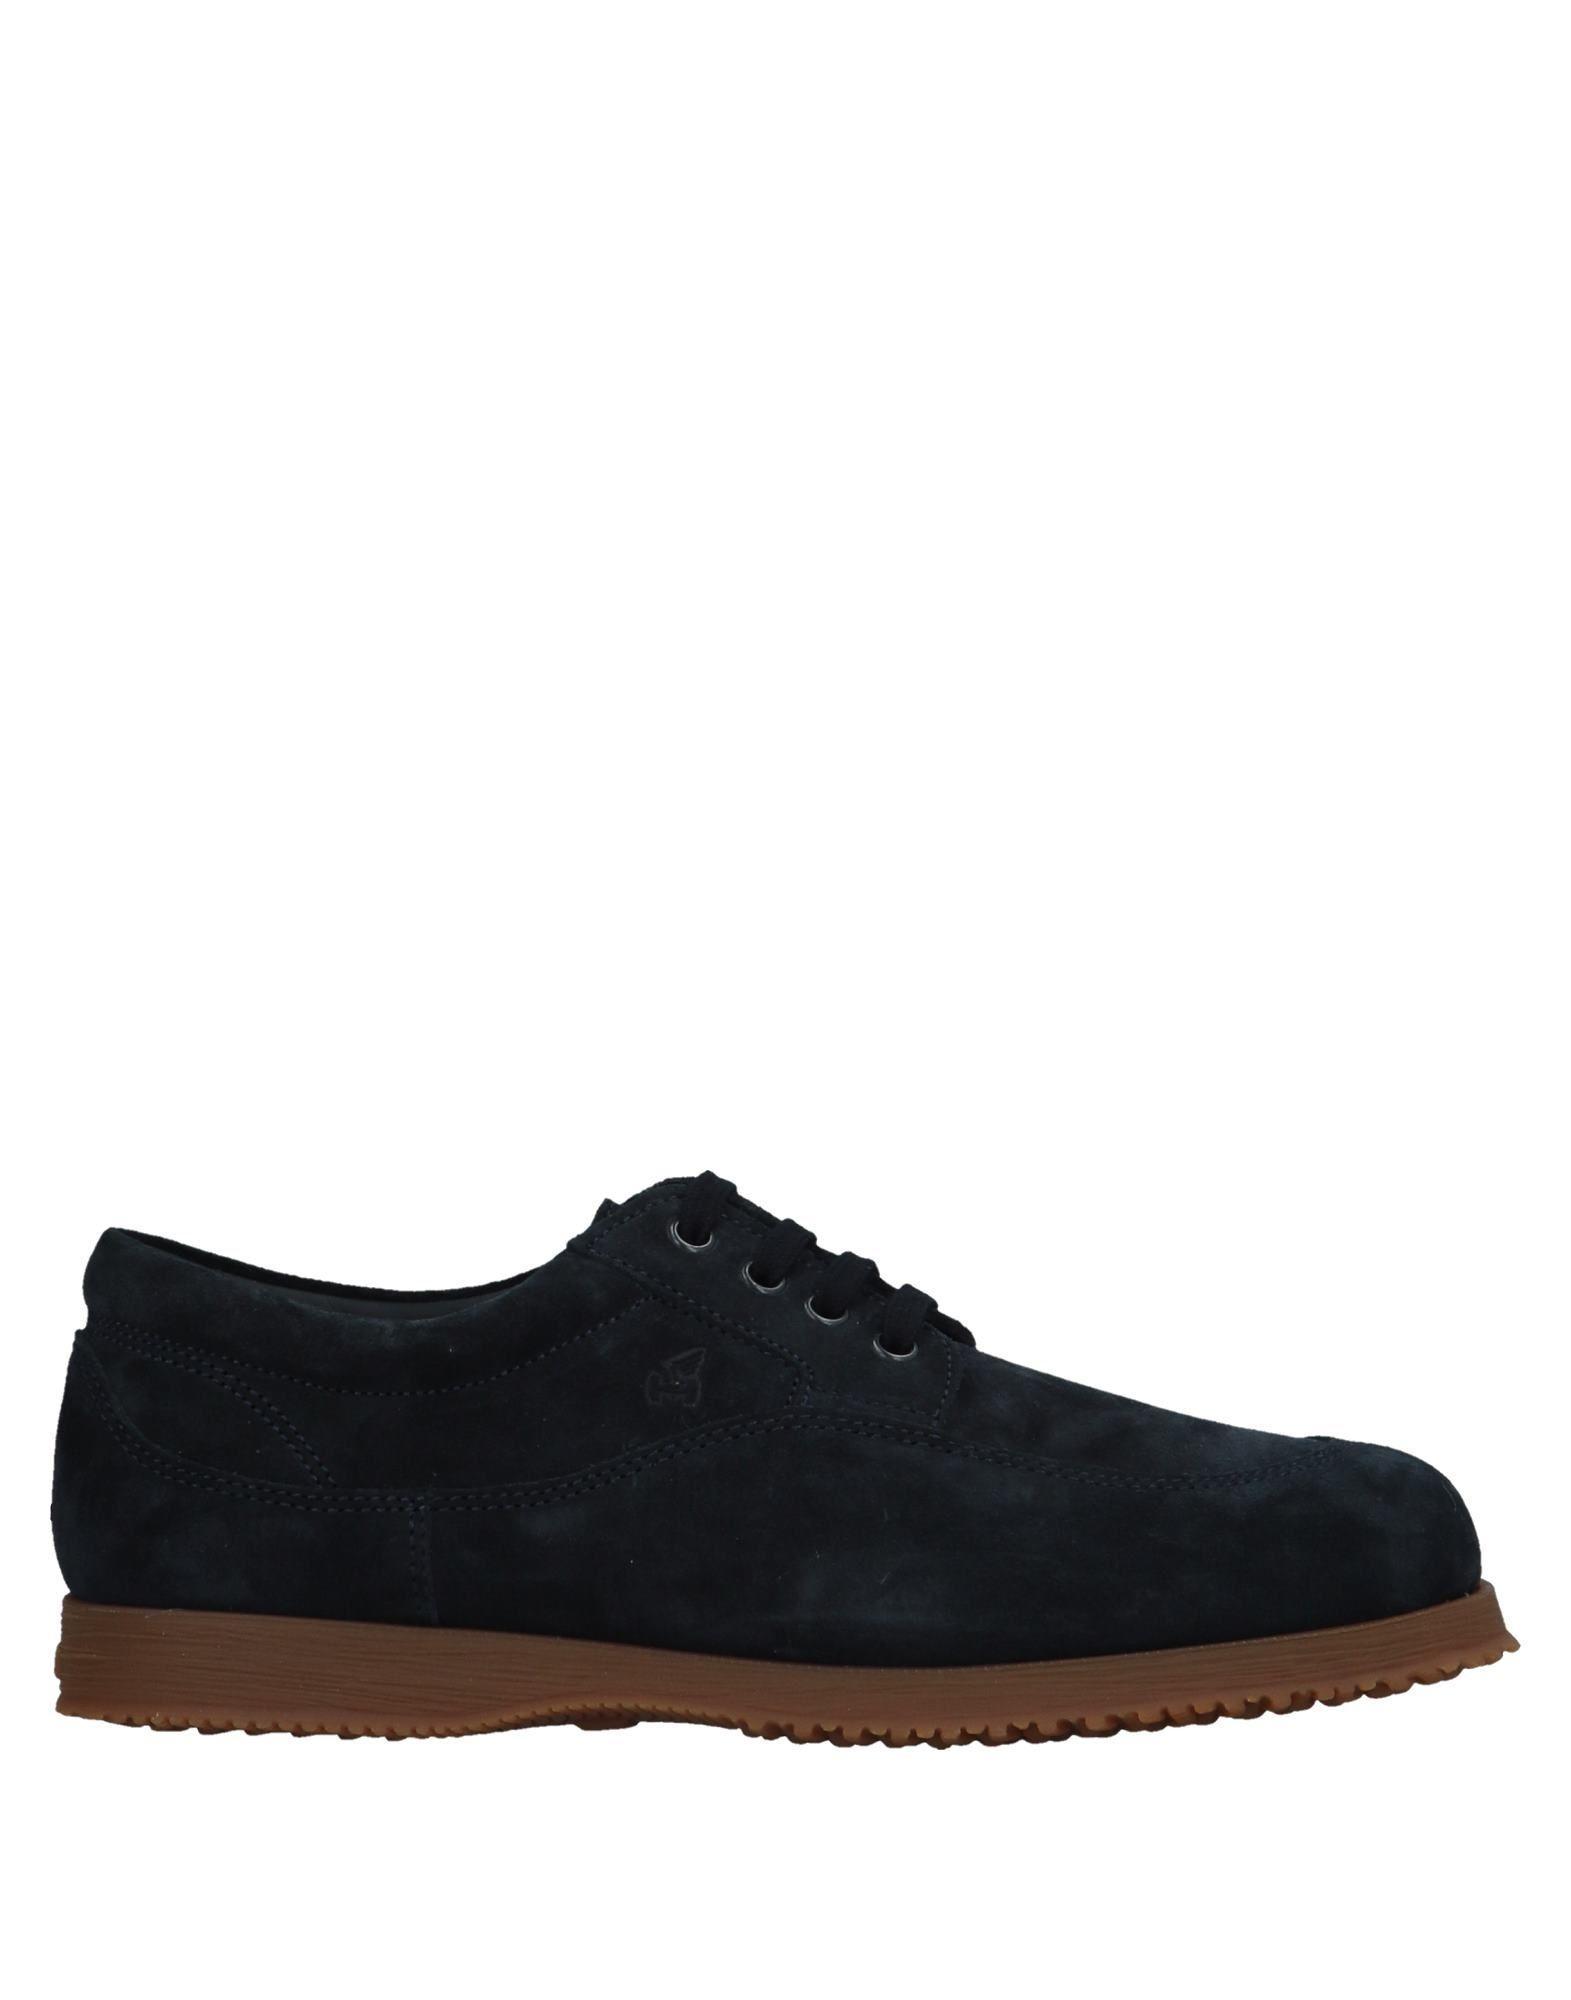 Hogan Sneakers Herren  11539407HC Gute Qualität beliebte Schuhe